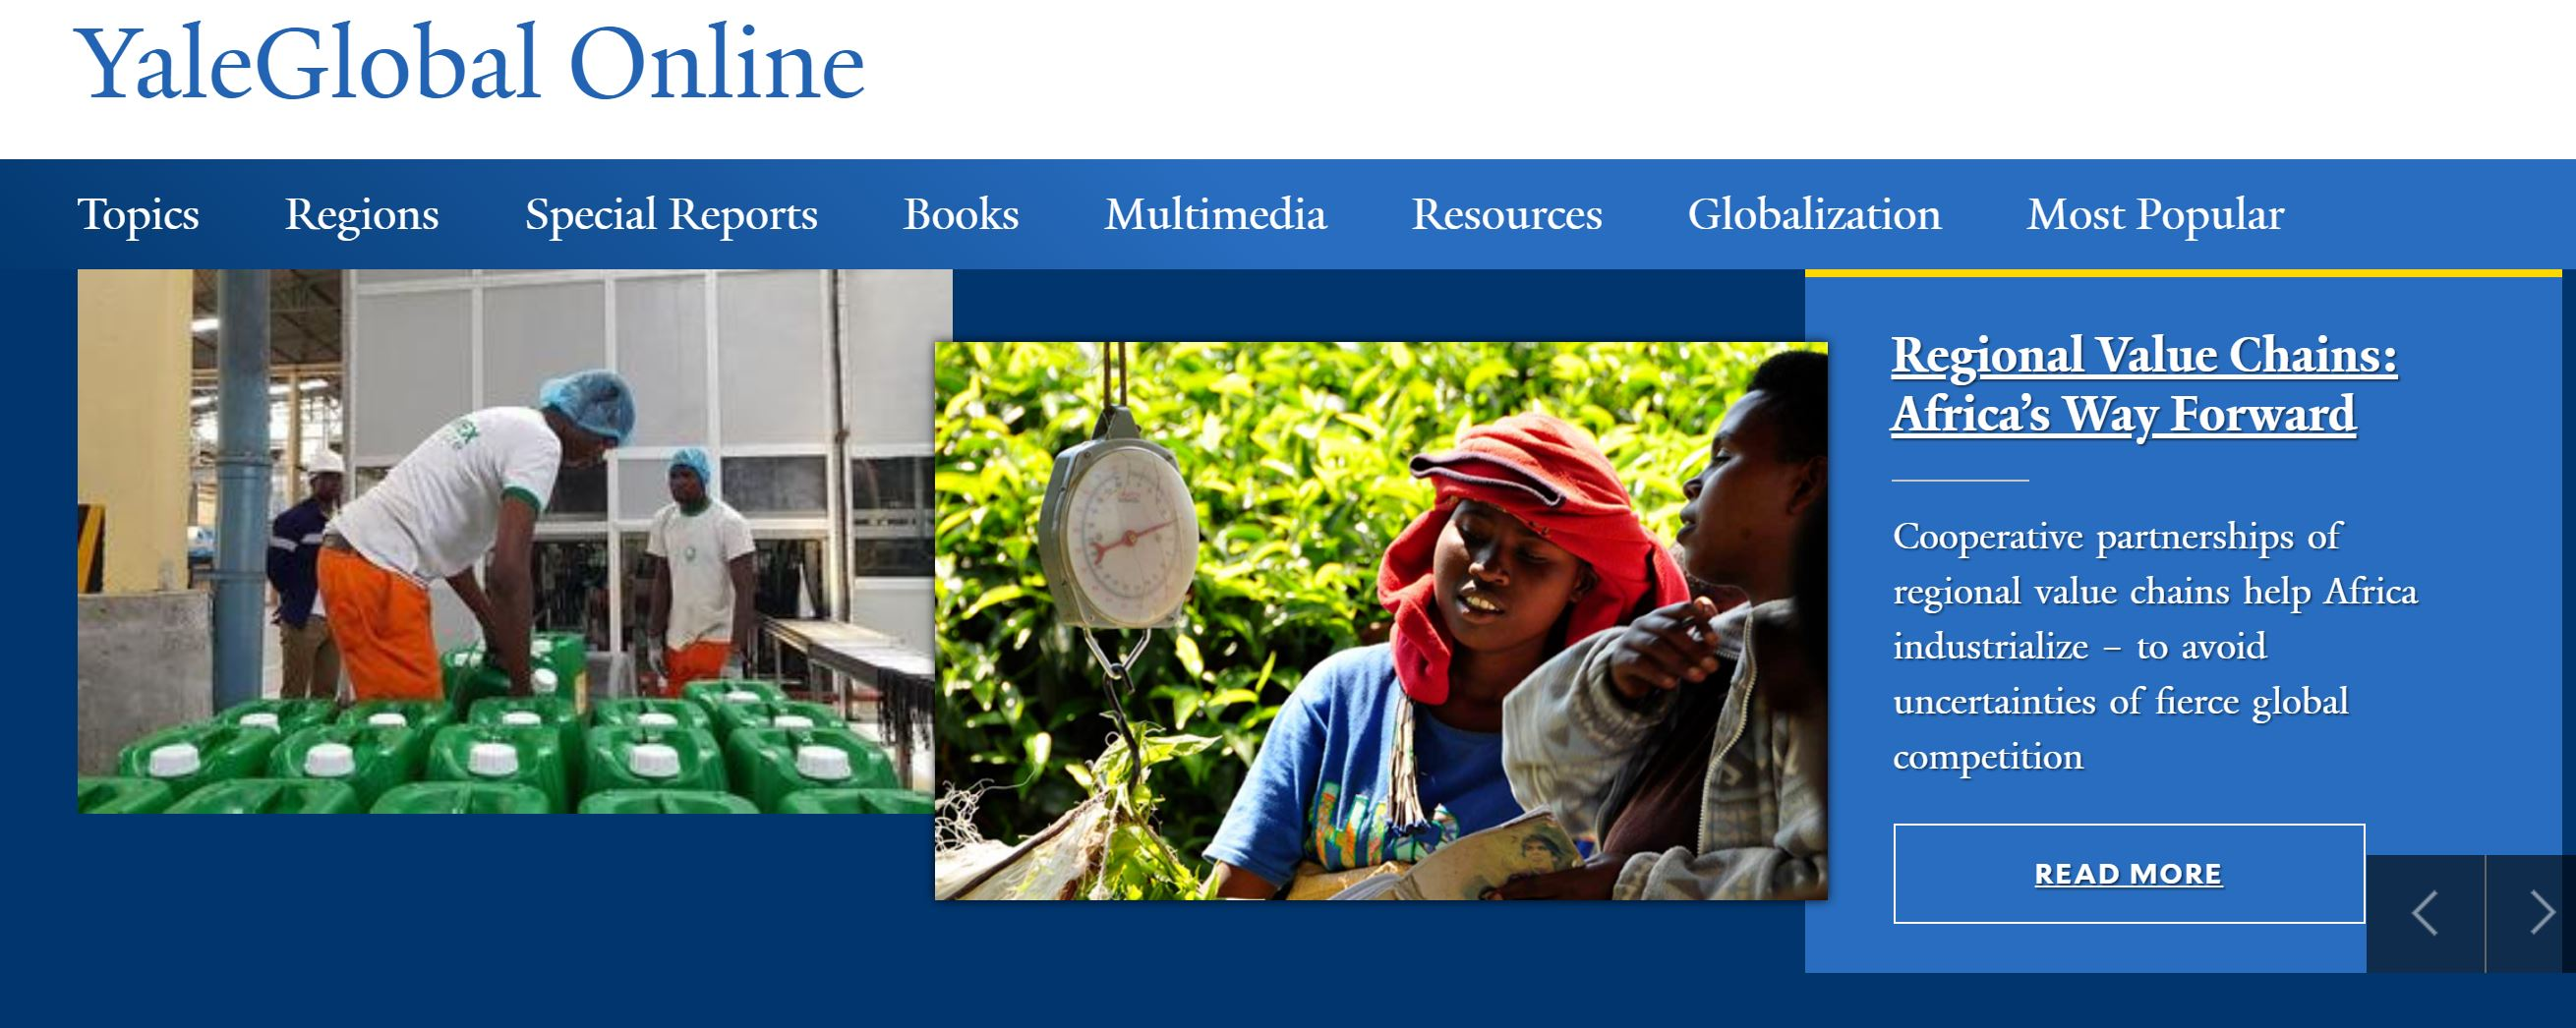 "Yale Global: ""Regional Value Chains: Africa's Way Forward"